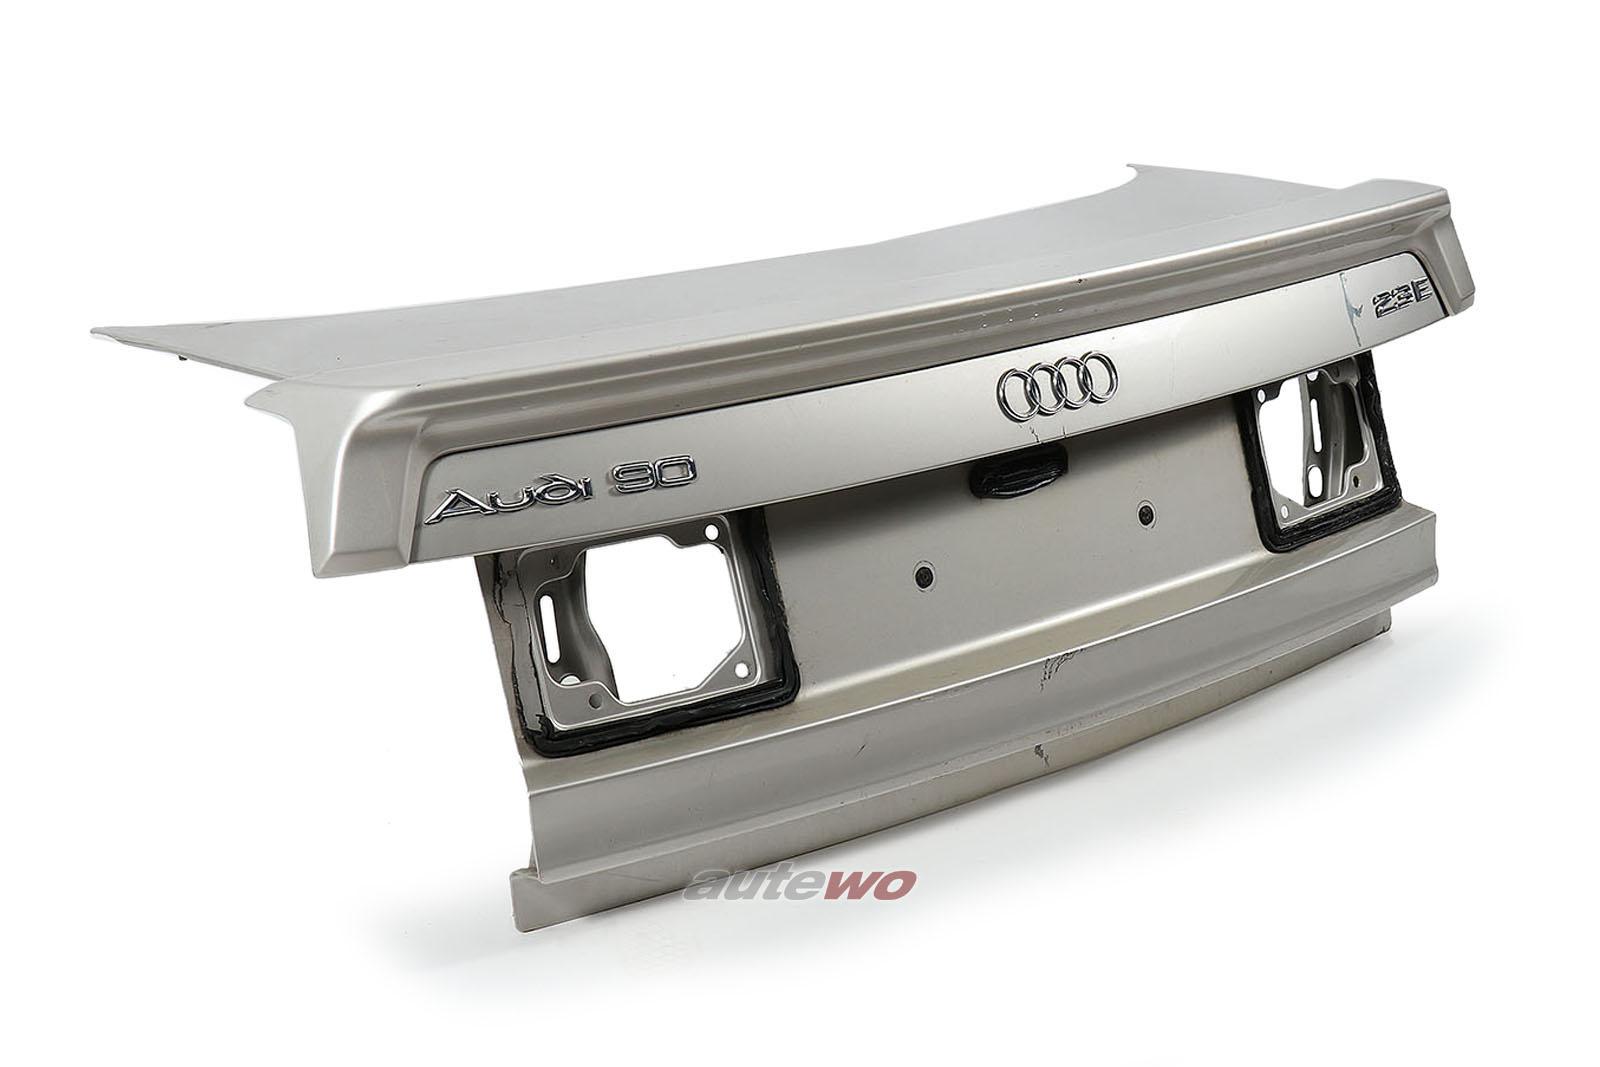 893827023 Audi 80/90 Typ 89 Limousine Heckklappe mit Heckspoiler Silber